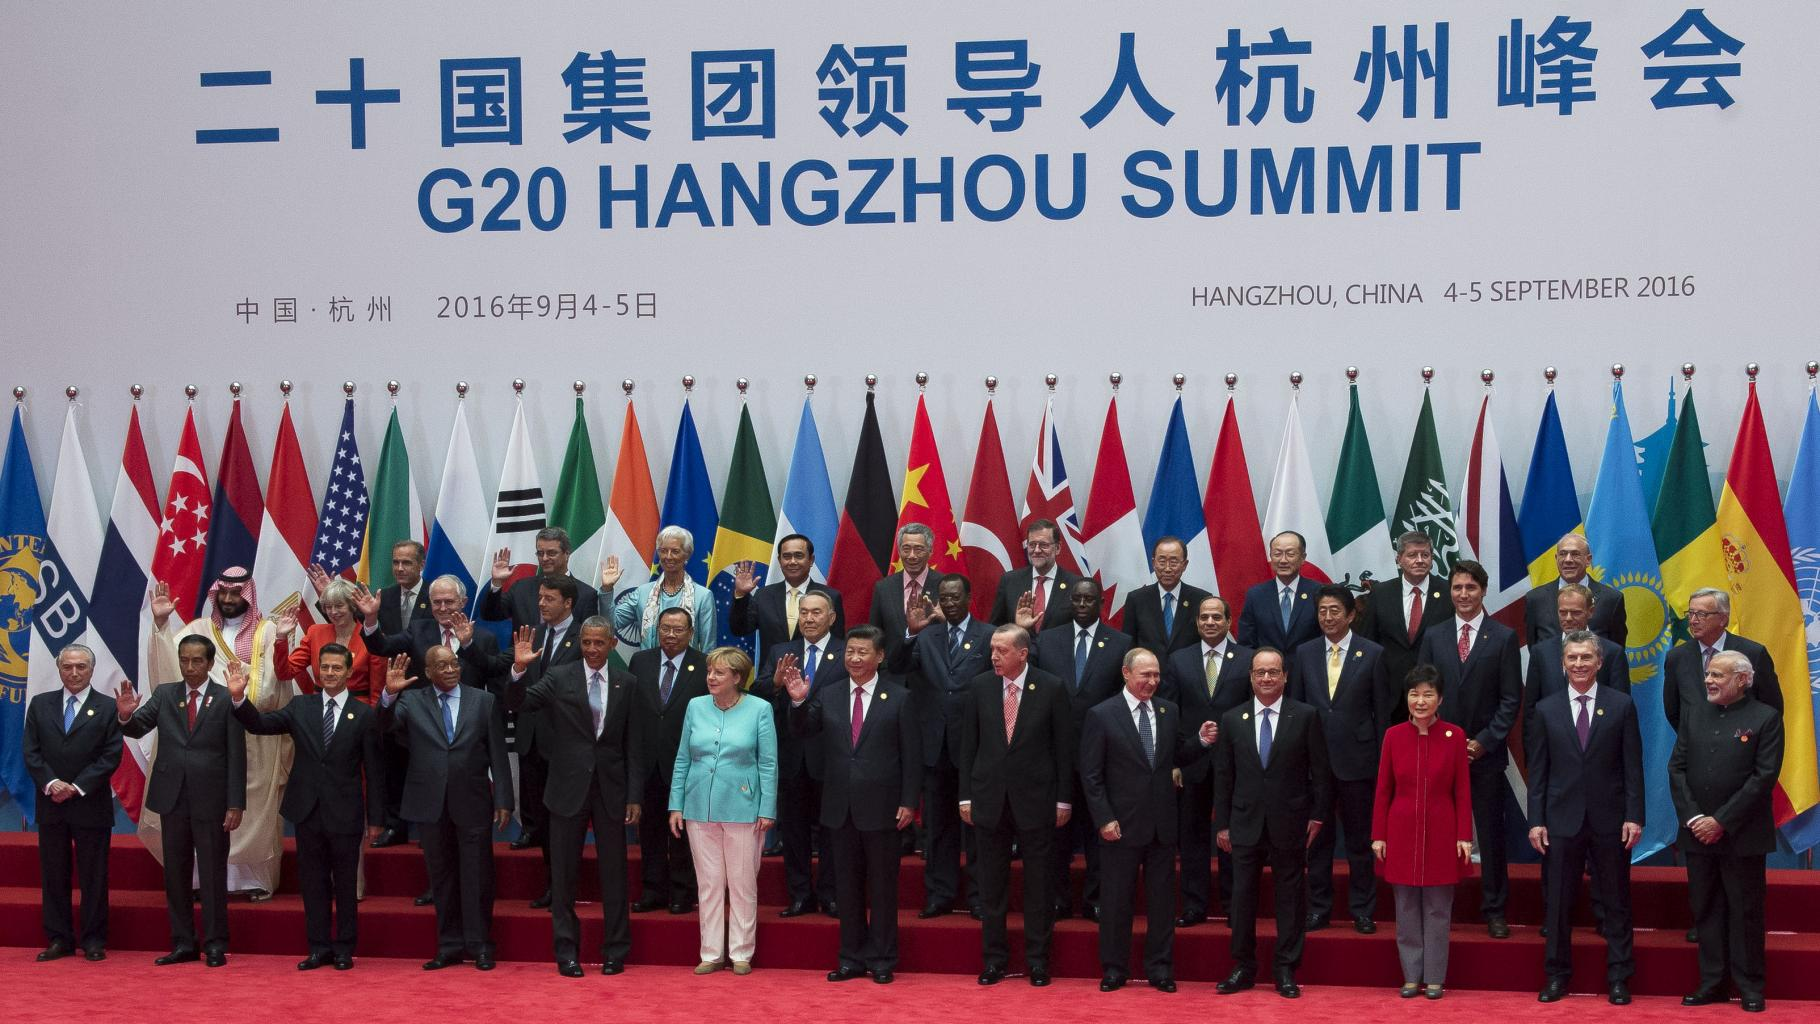 Gruppenbild G20 2016 in China